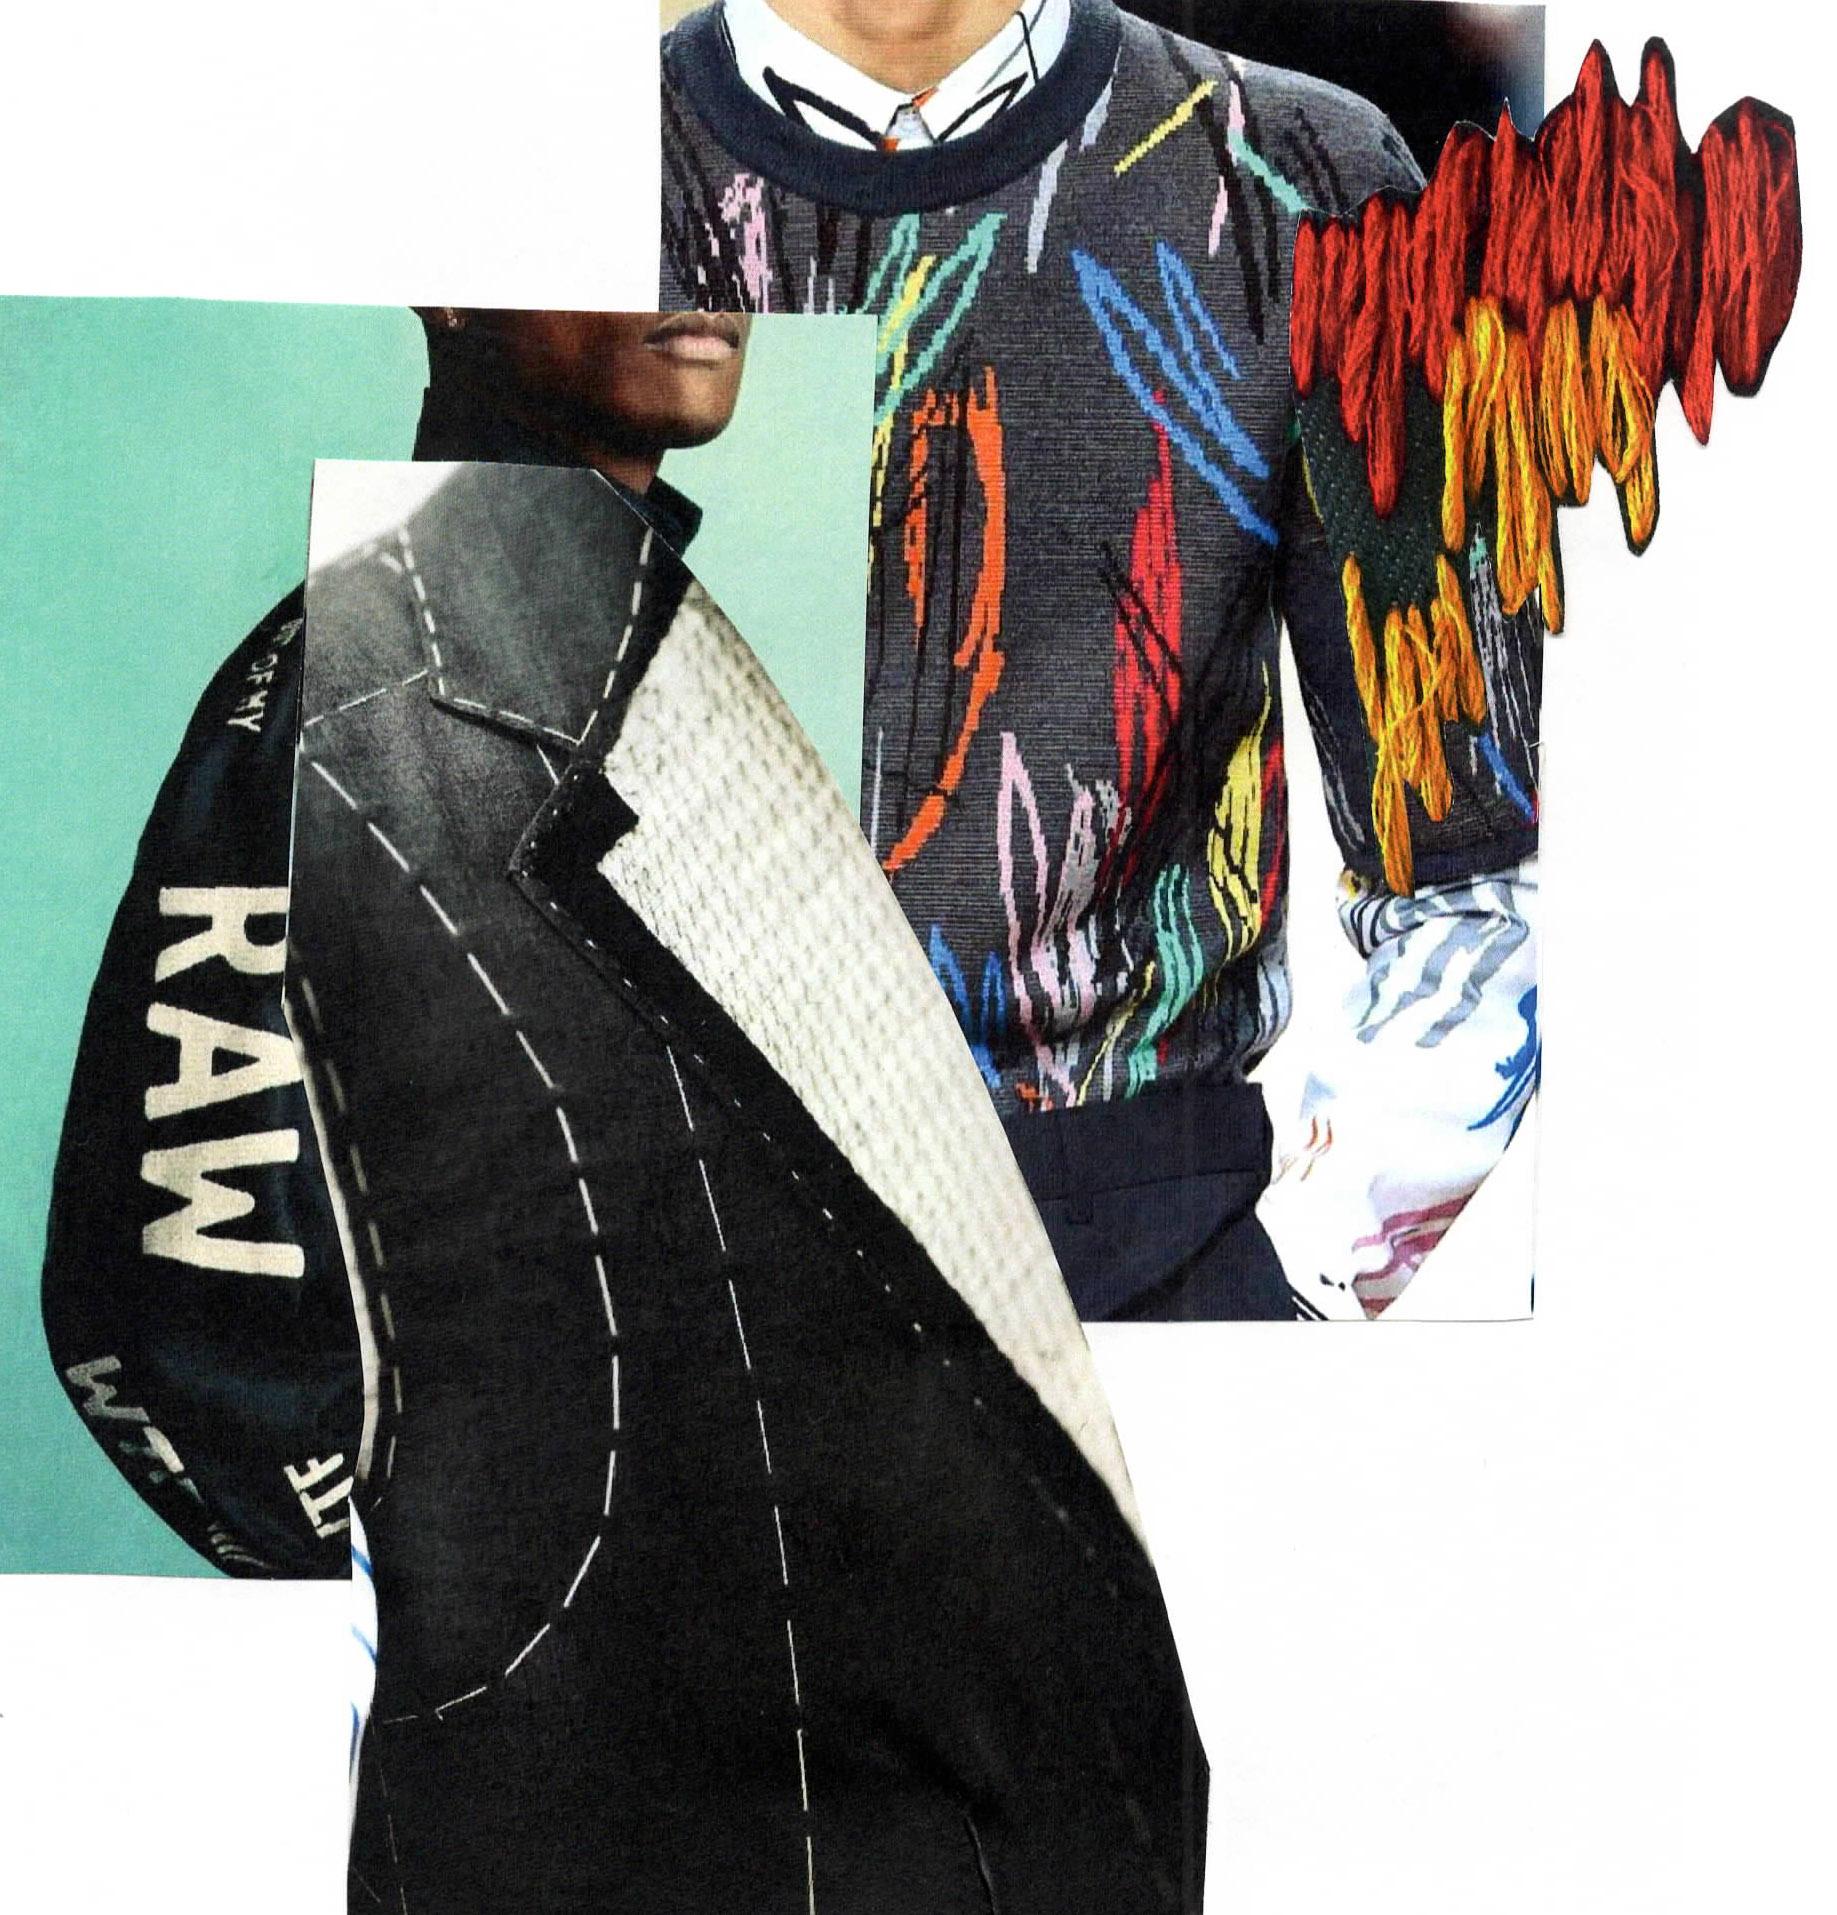 Raw_Collage.jpg